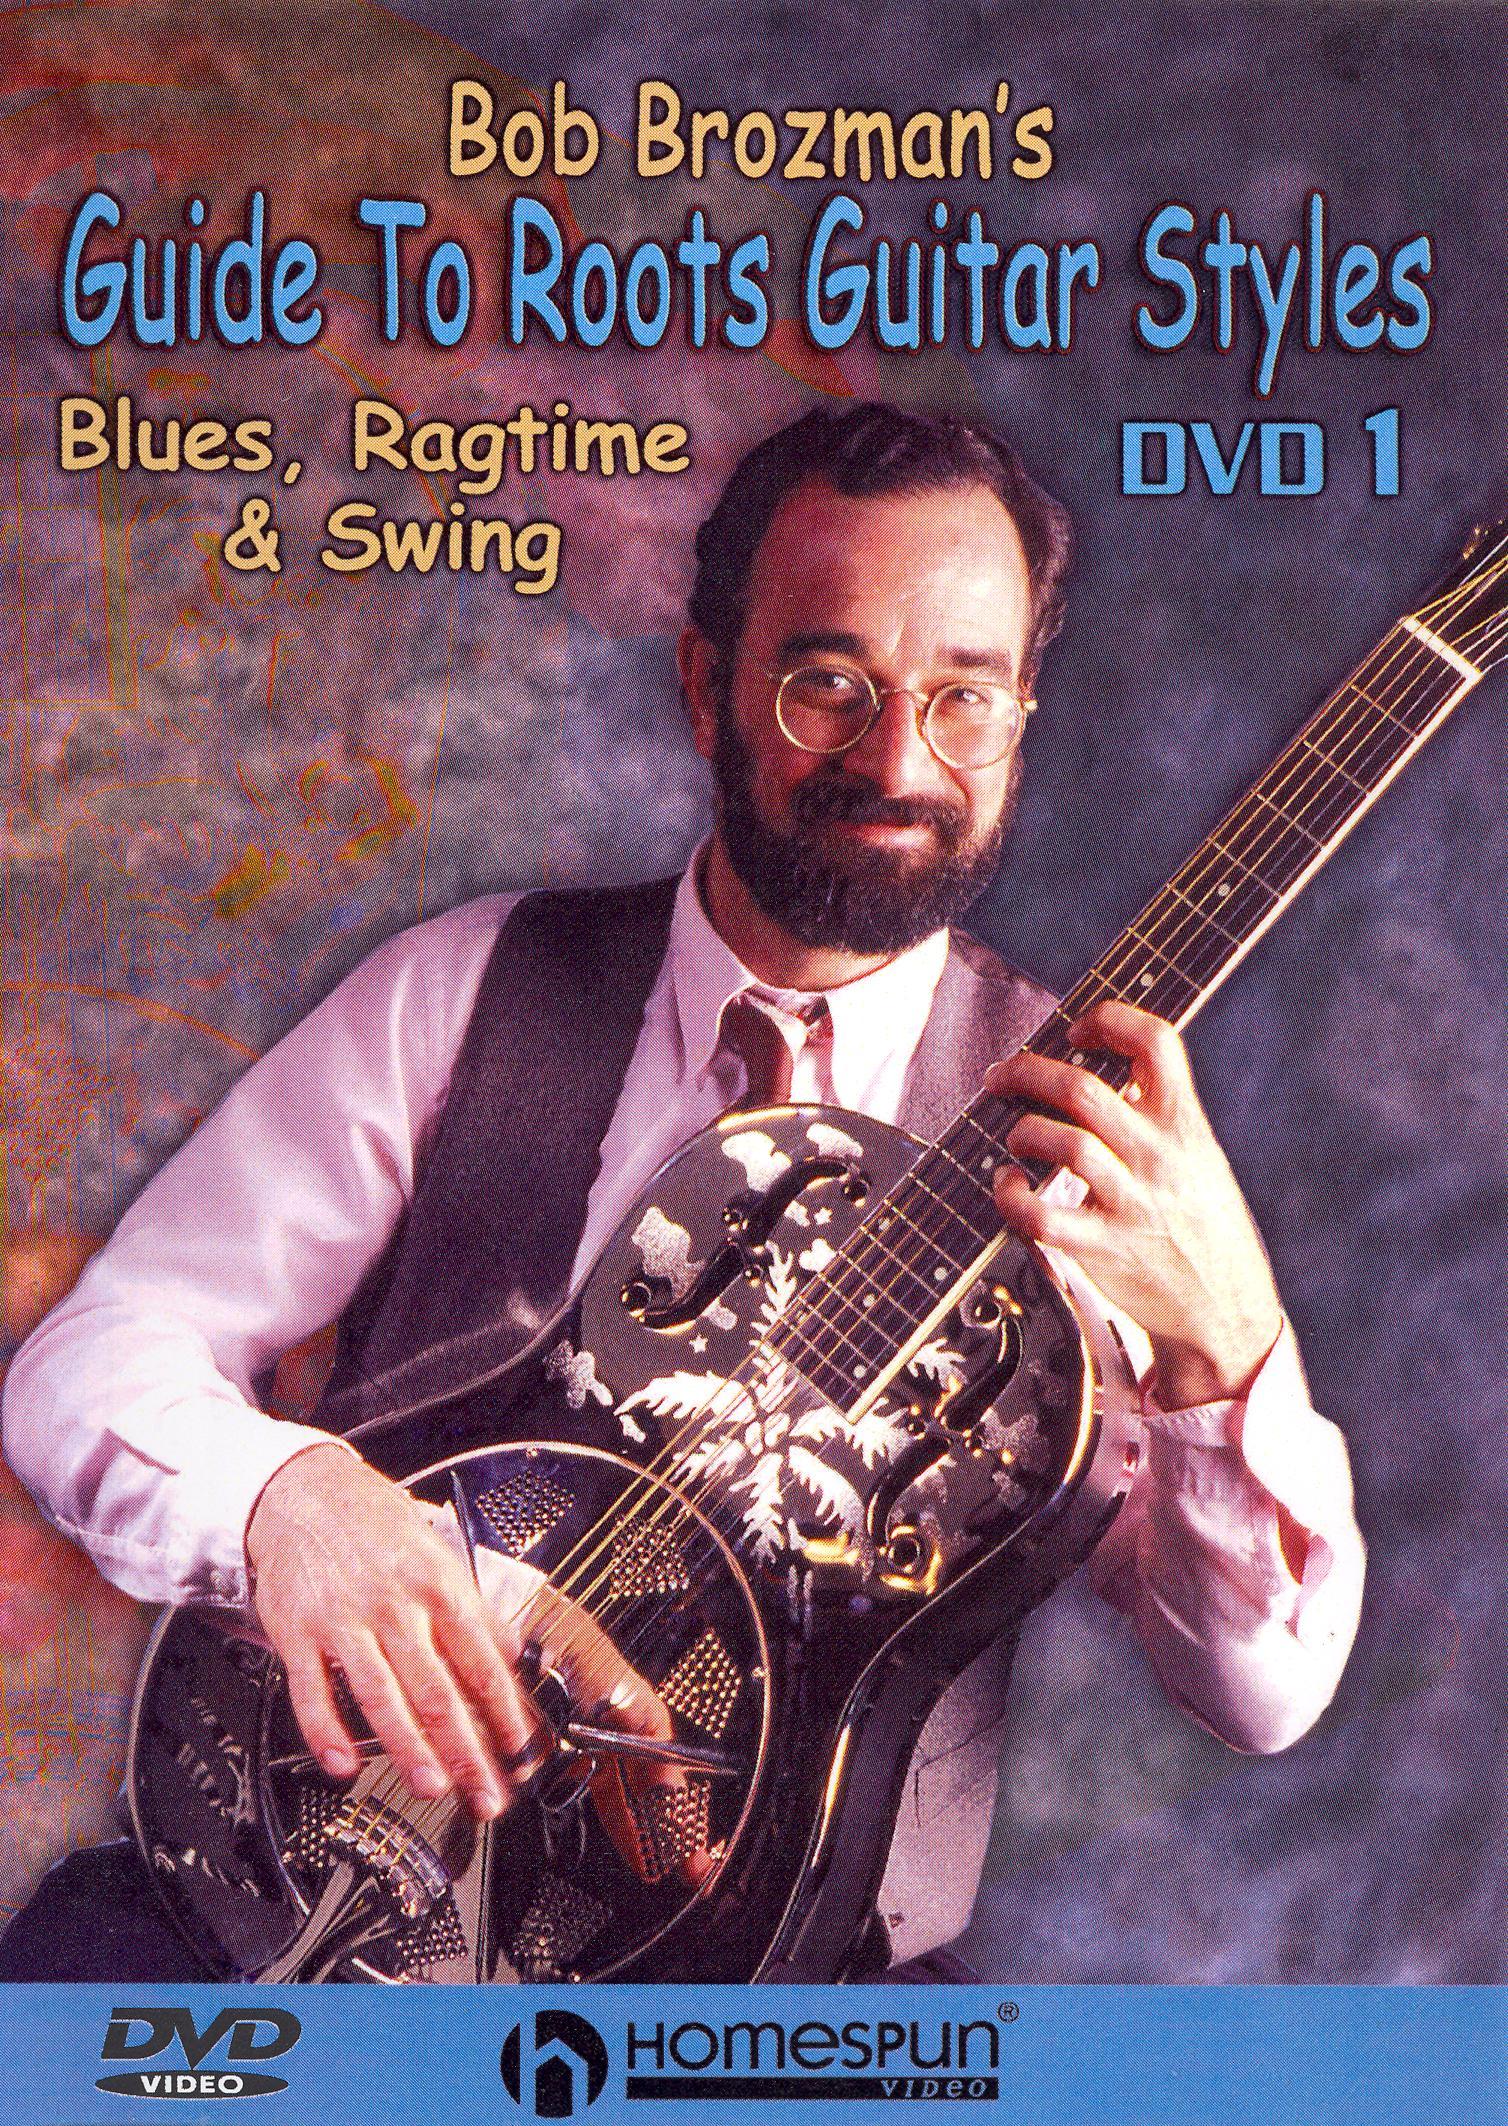 Bob Brozman's Guide to Roots Guitar Styles, Vol. 1